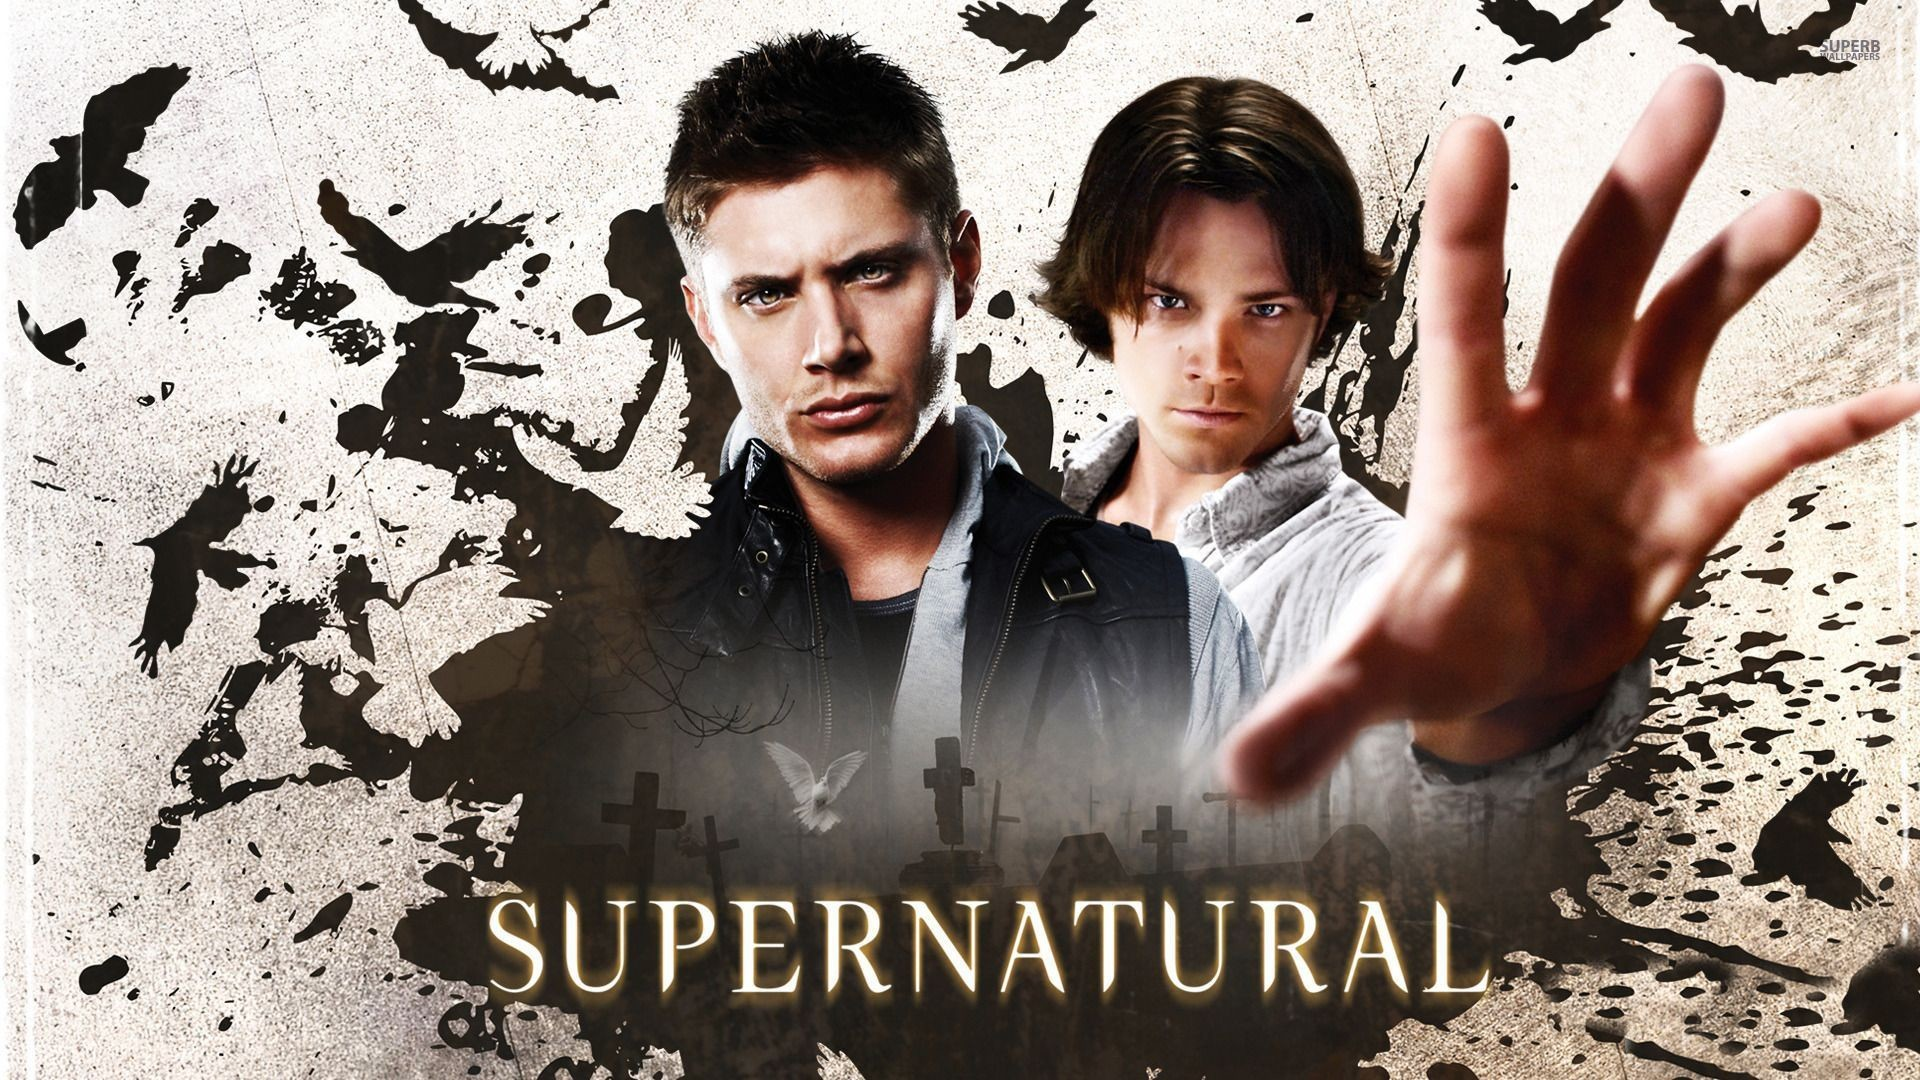 Supernatural wallpaper – TV Show wallpapers – #15005